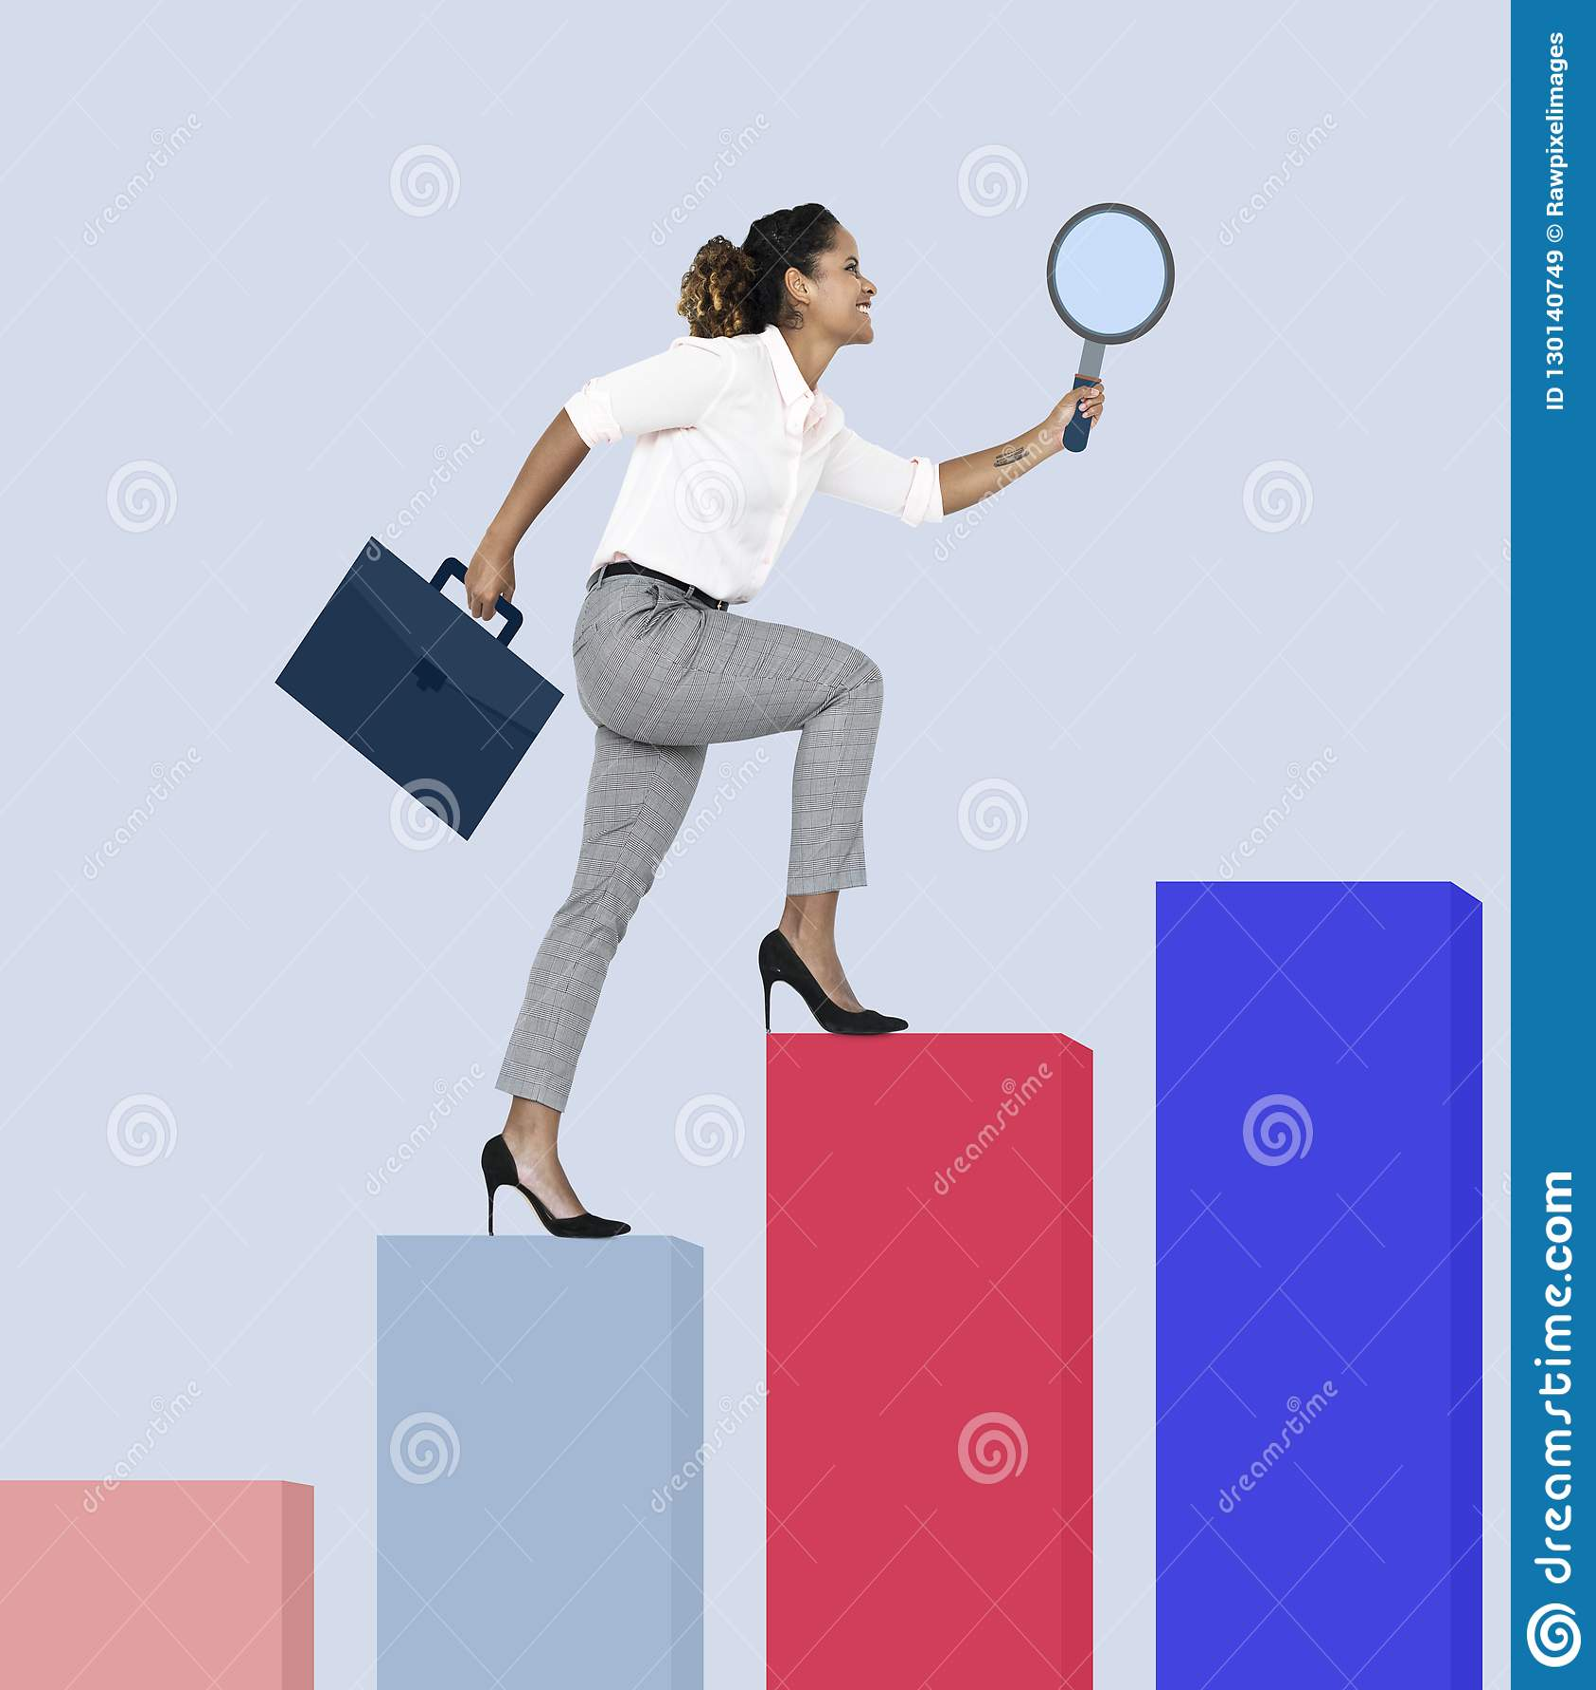 Шаг бизнес-леди до достижения